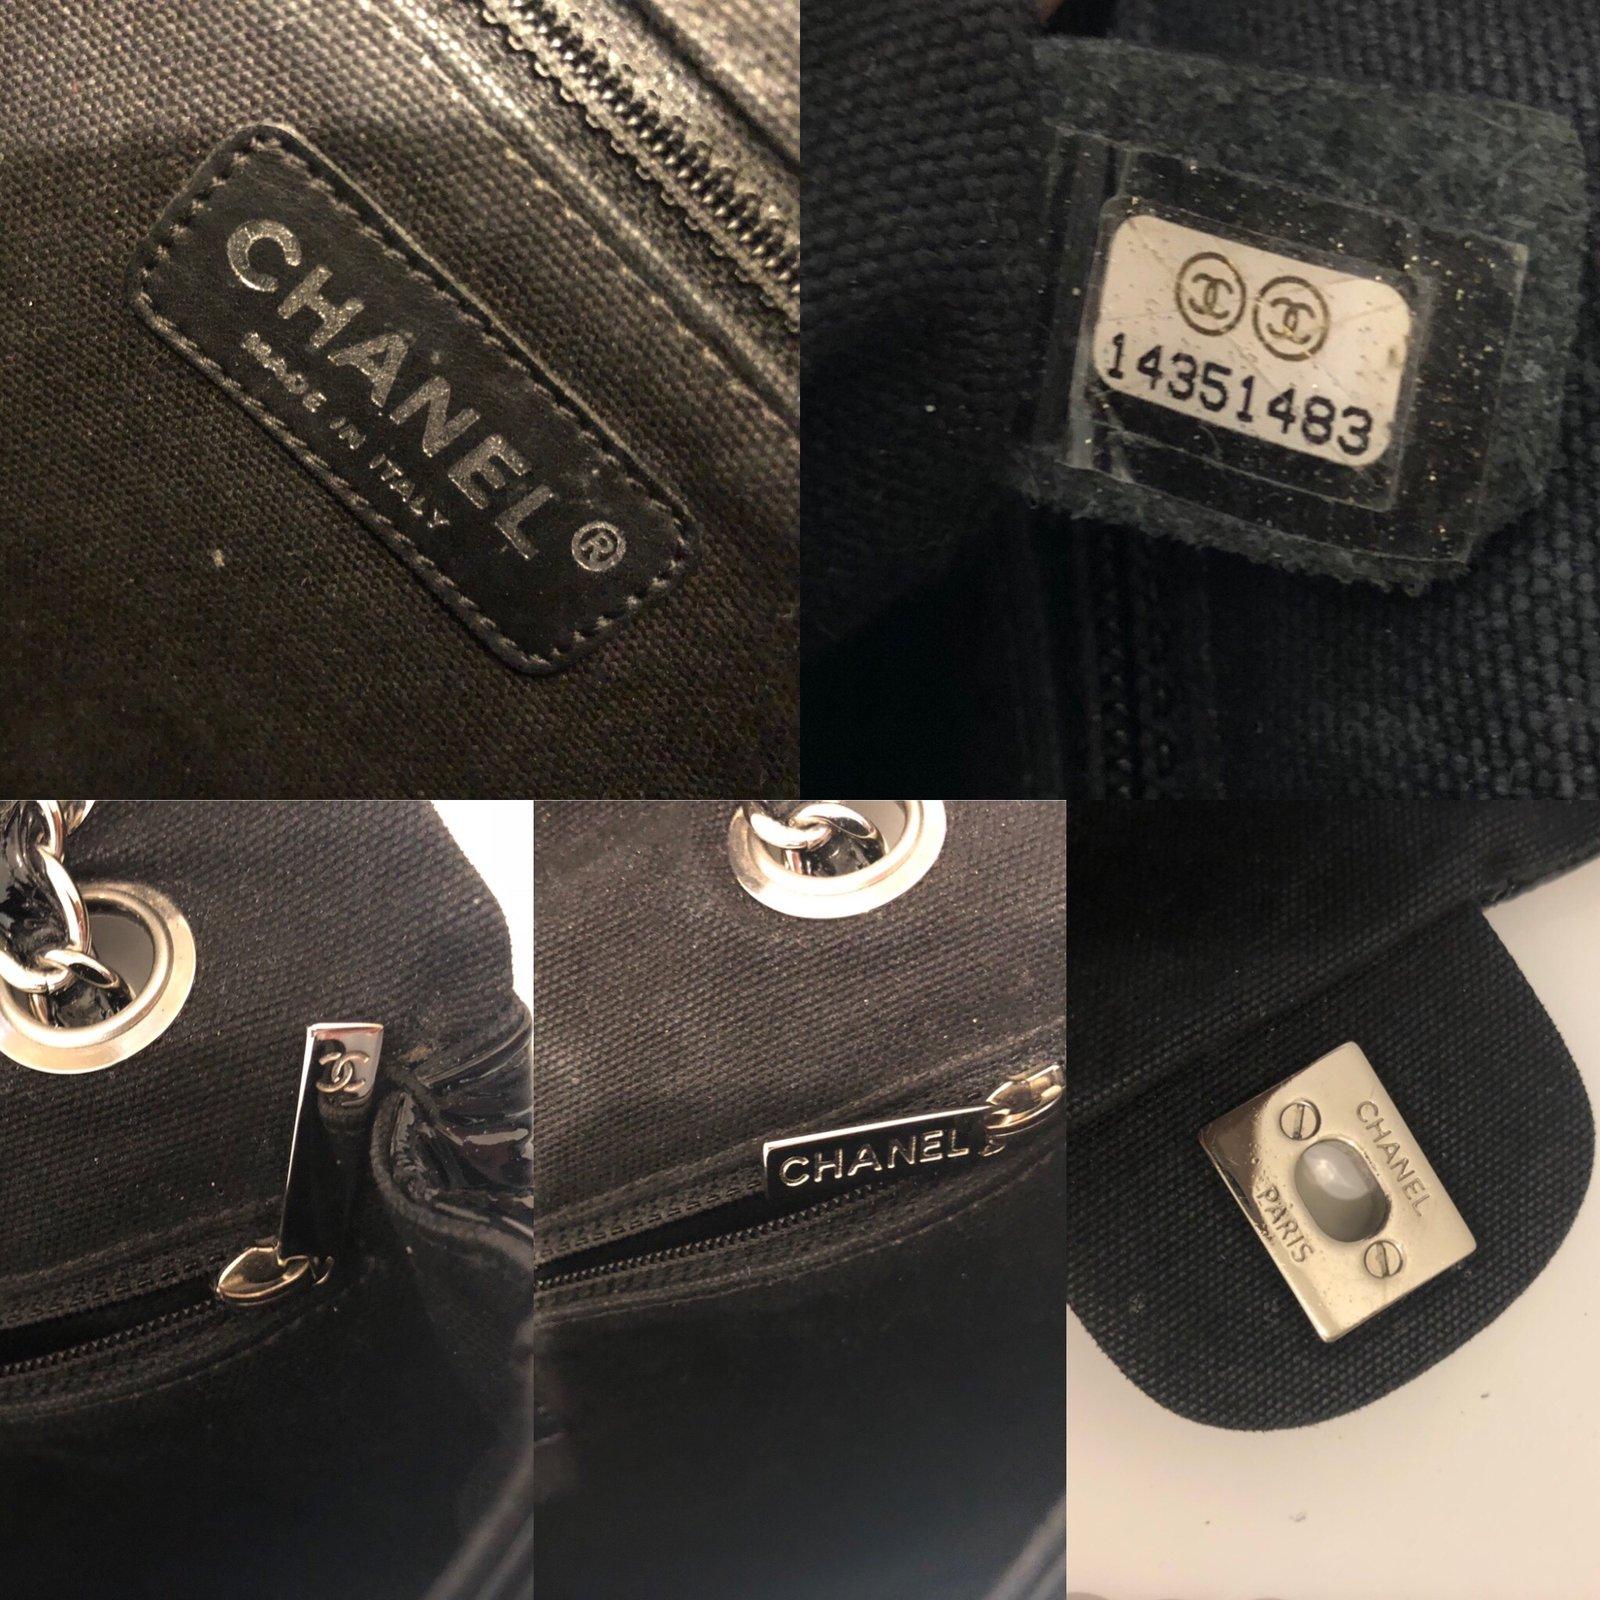 ffb09716786ea1 Chanel TIMELESS Handbags Patent leather Black ref.81777 - Joli Closet